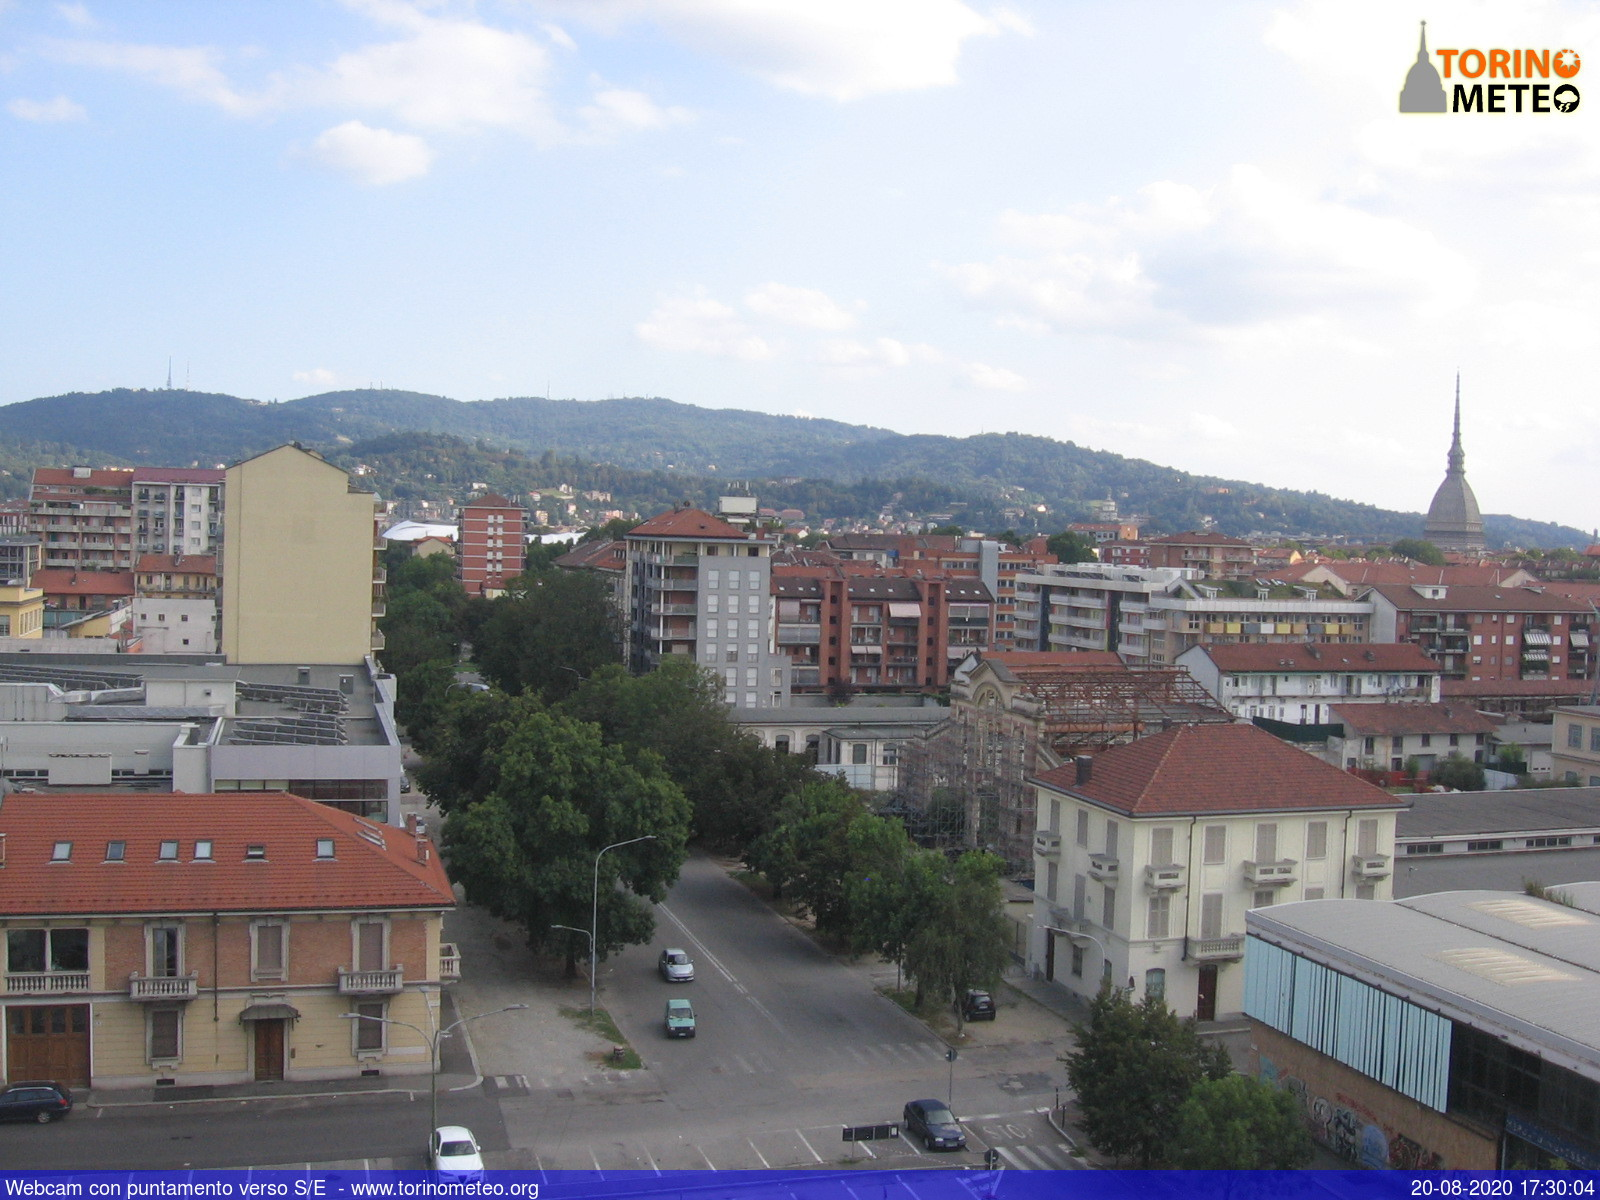 Webcam di Torino, Piemonte